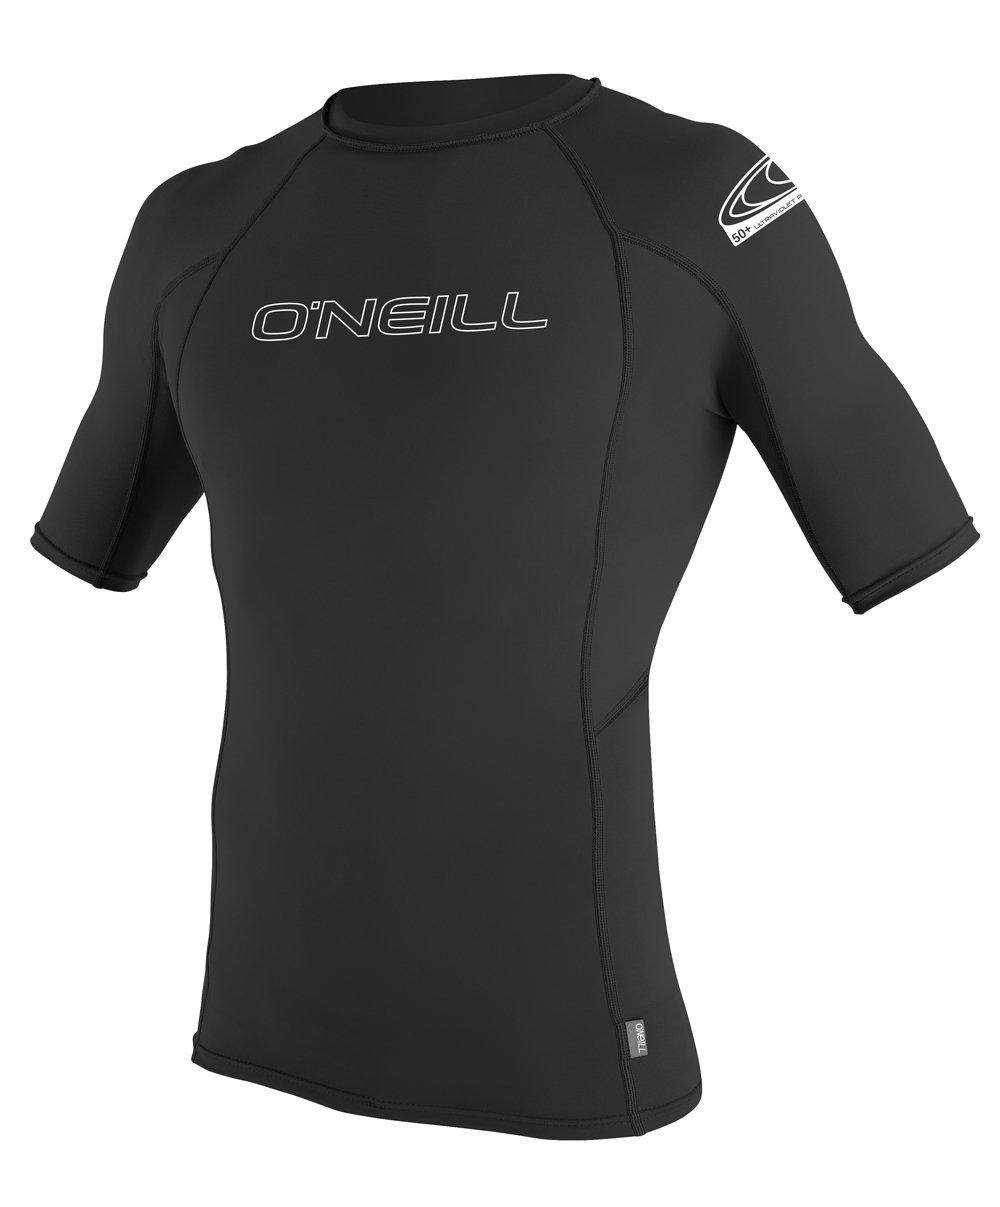 O'Neill Wetsuits Men's Basic Skins UPF 50+ Short Sleeve Rash Guard, Black, Medium